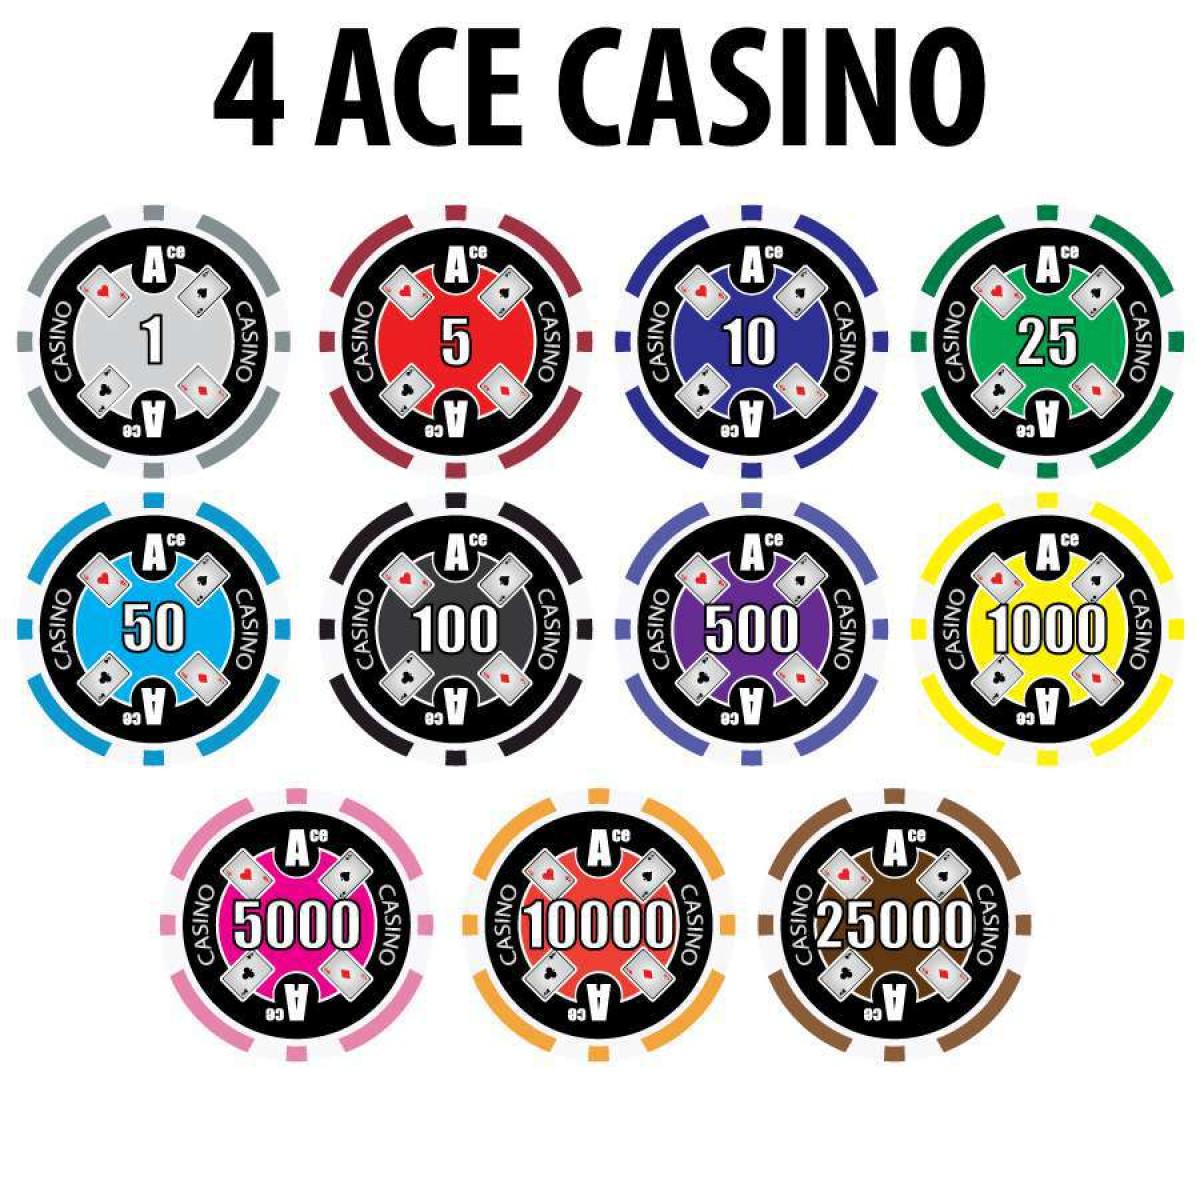 aces up poker clubs phoenix